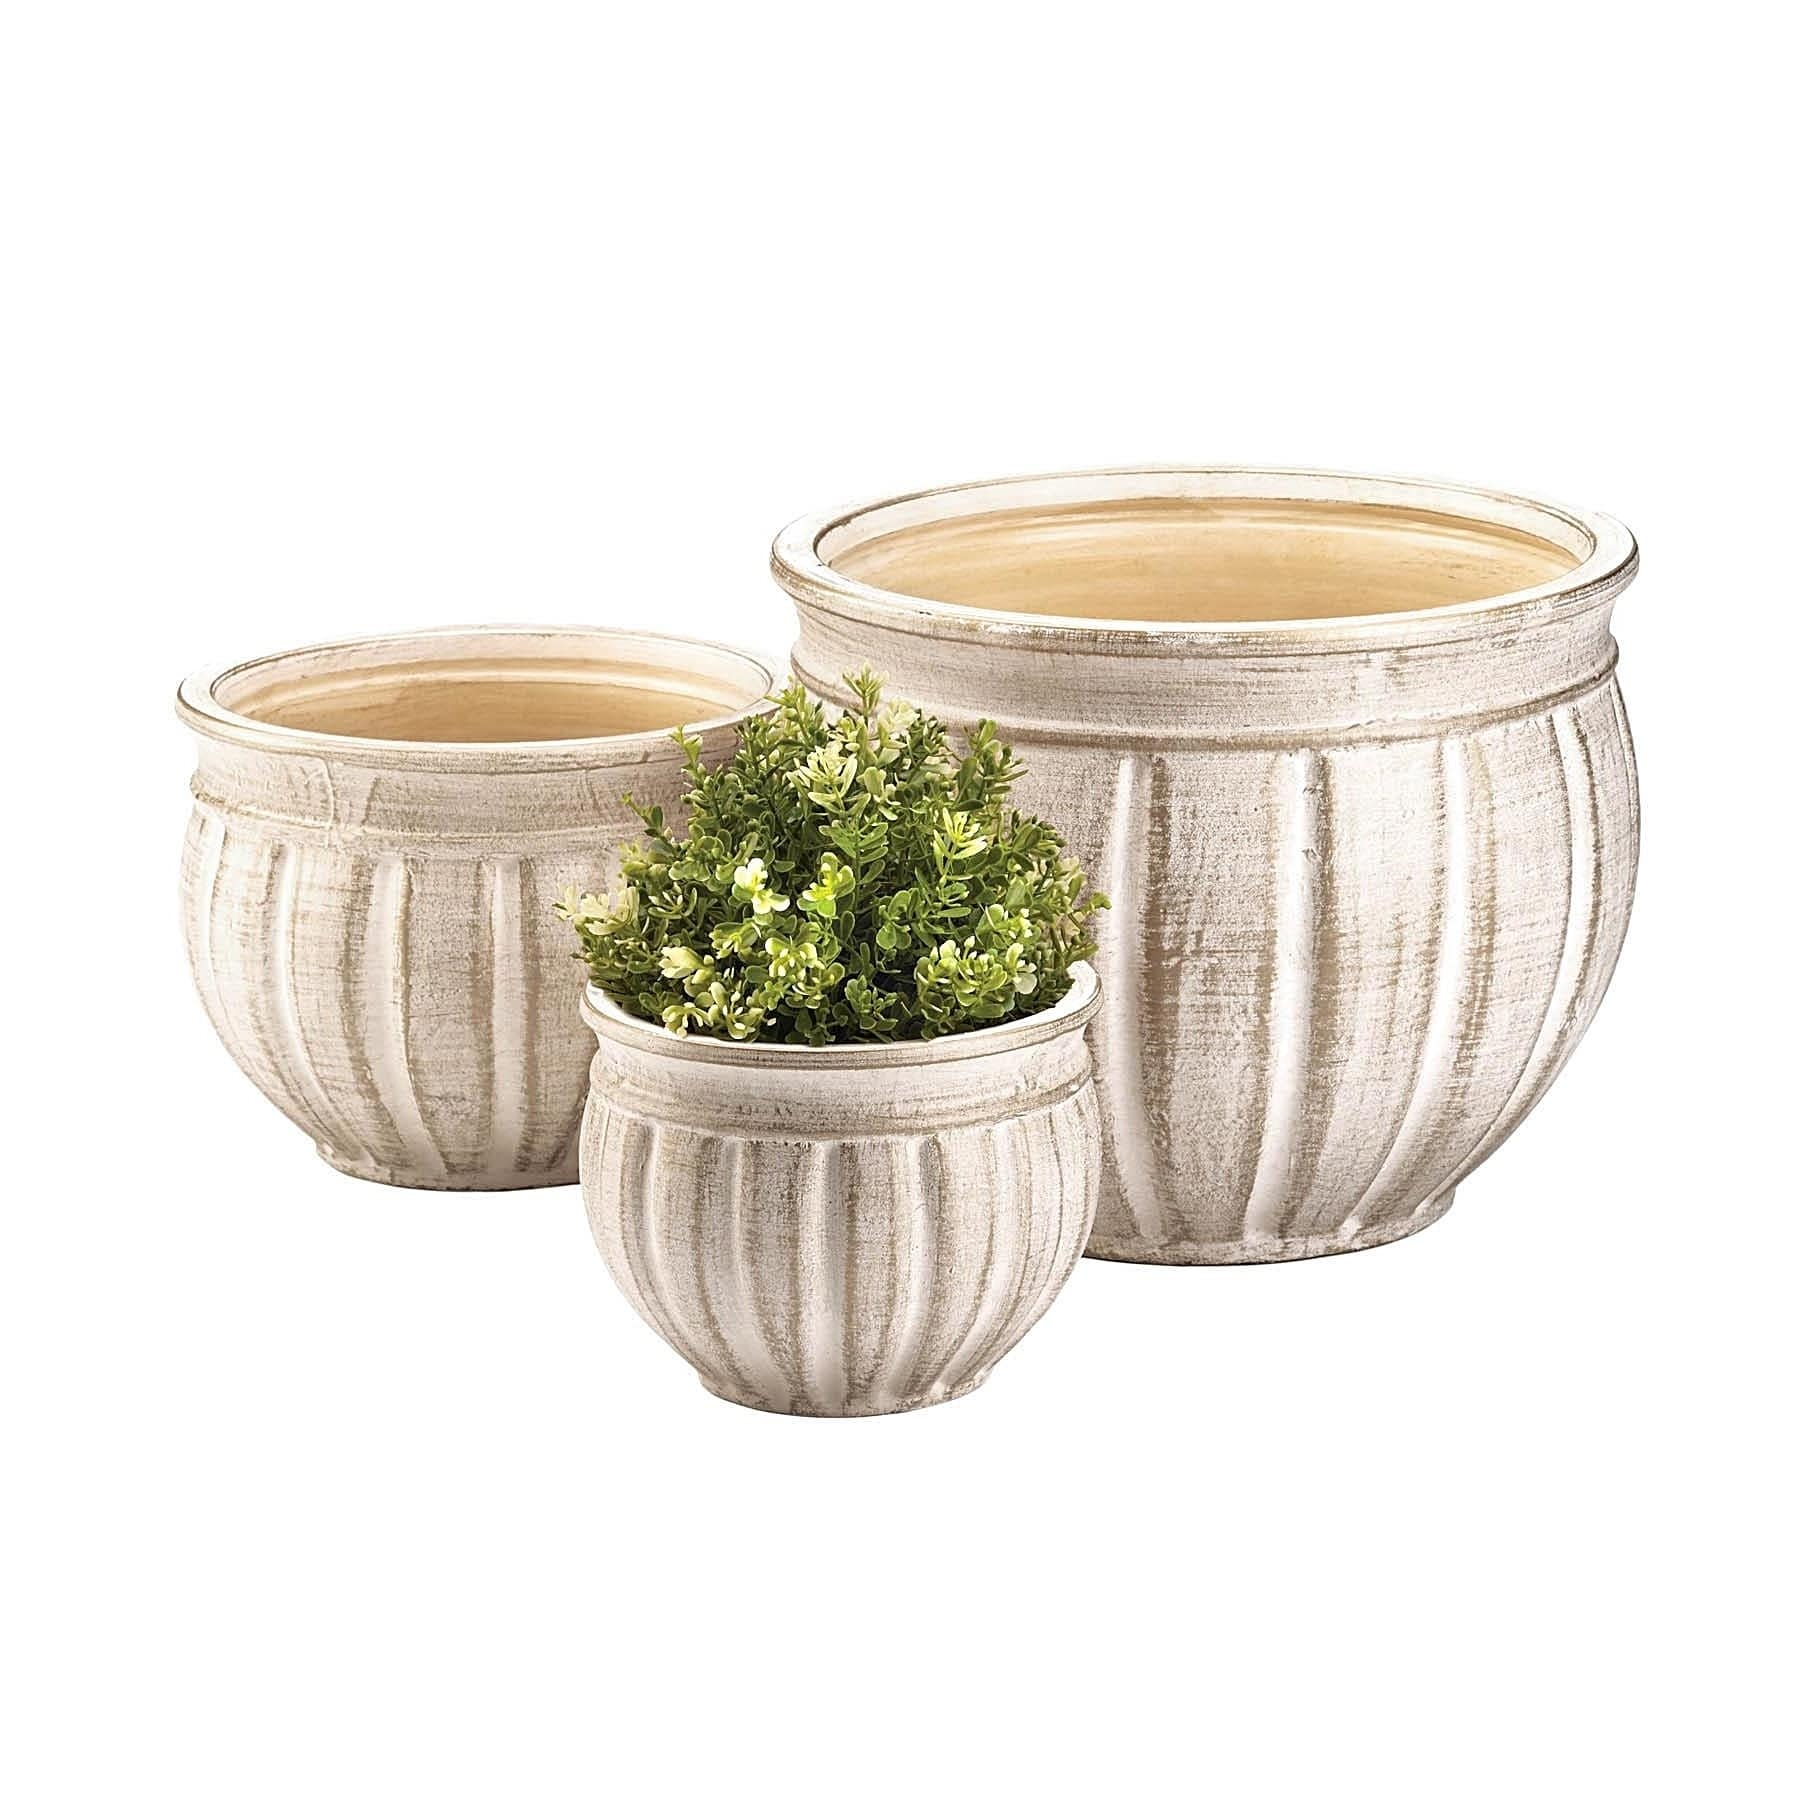 Haysville Vintage Ceramic Plant Holders - Set of 3